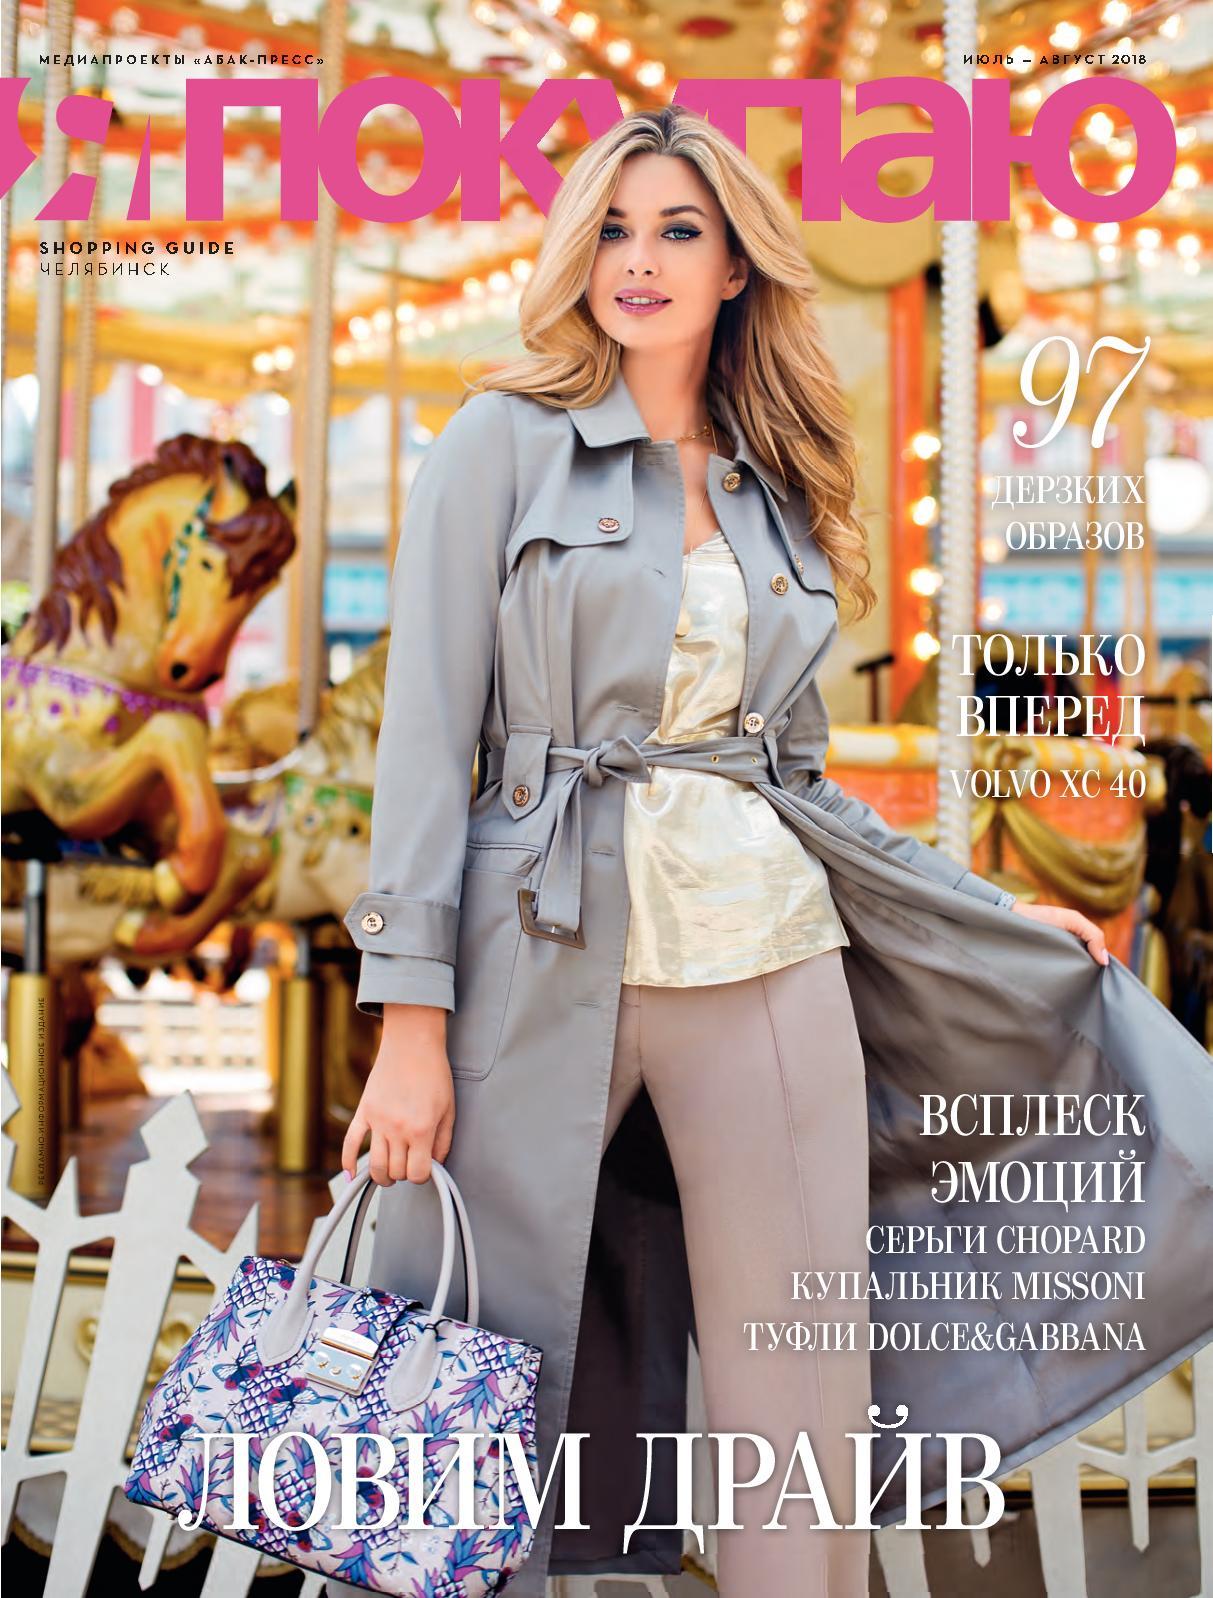 Calaméo - Shopping Guide «Я Покупаю. Челябинск», июль—август 2018 e3965870318